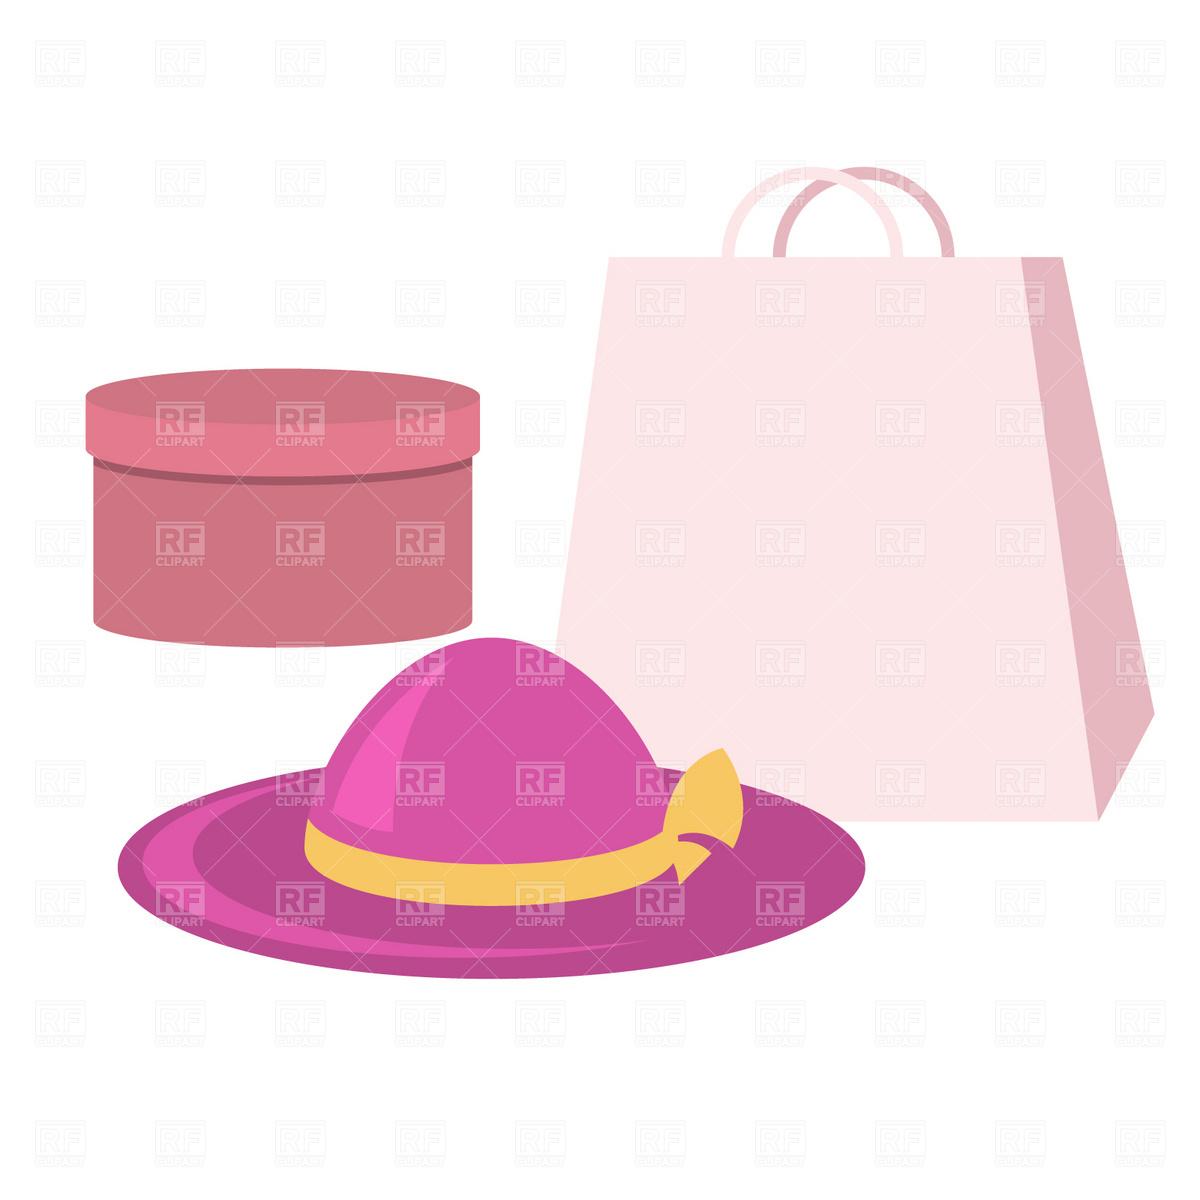 1200x1200 Shopping Bag, Bonnet And Hatbox Royalty Free Vector Clip Art Image